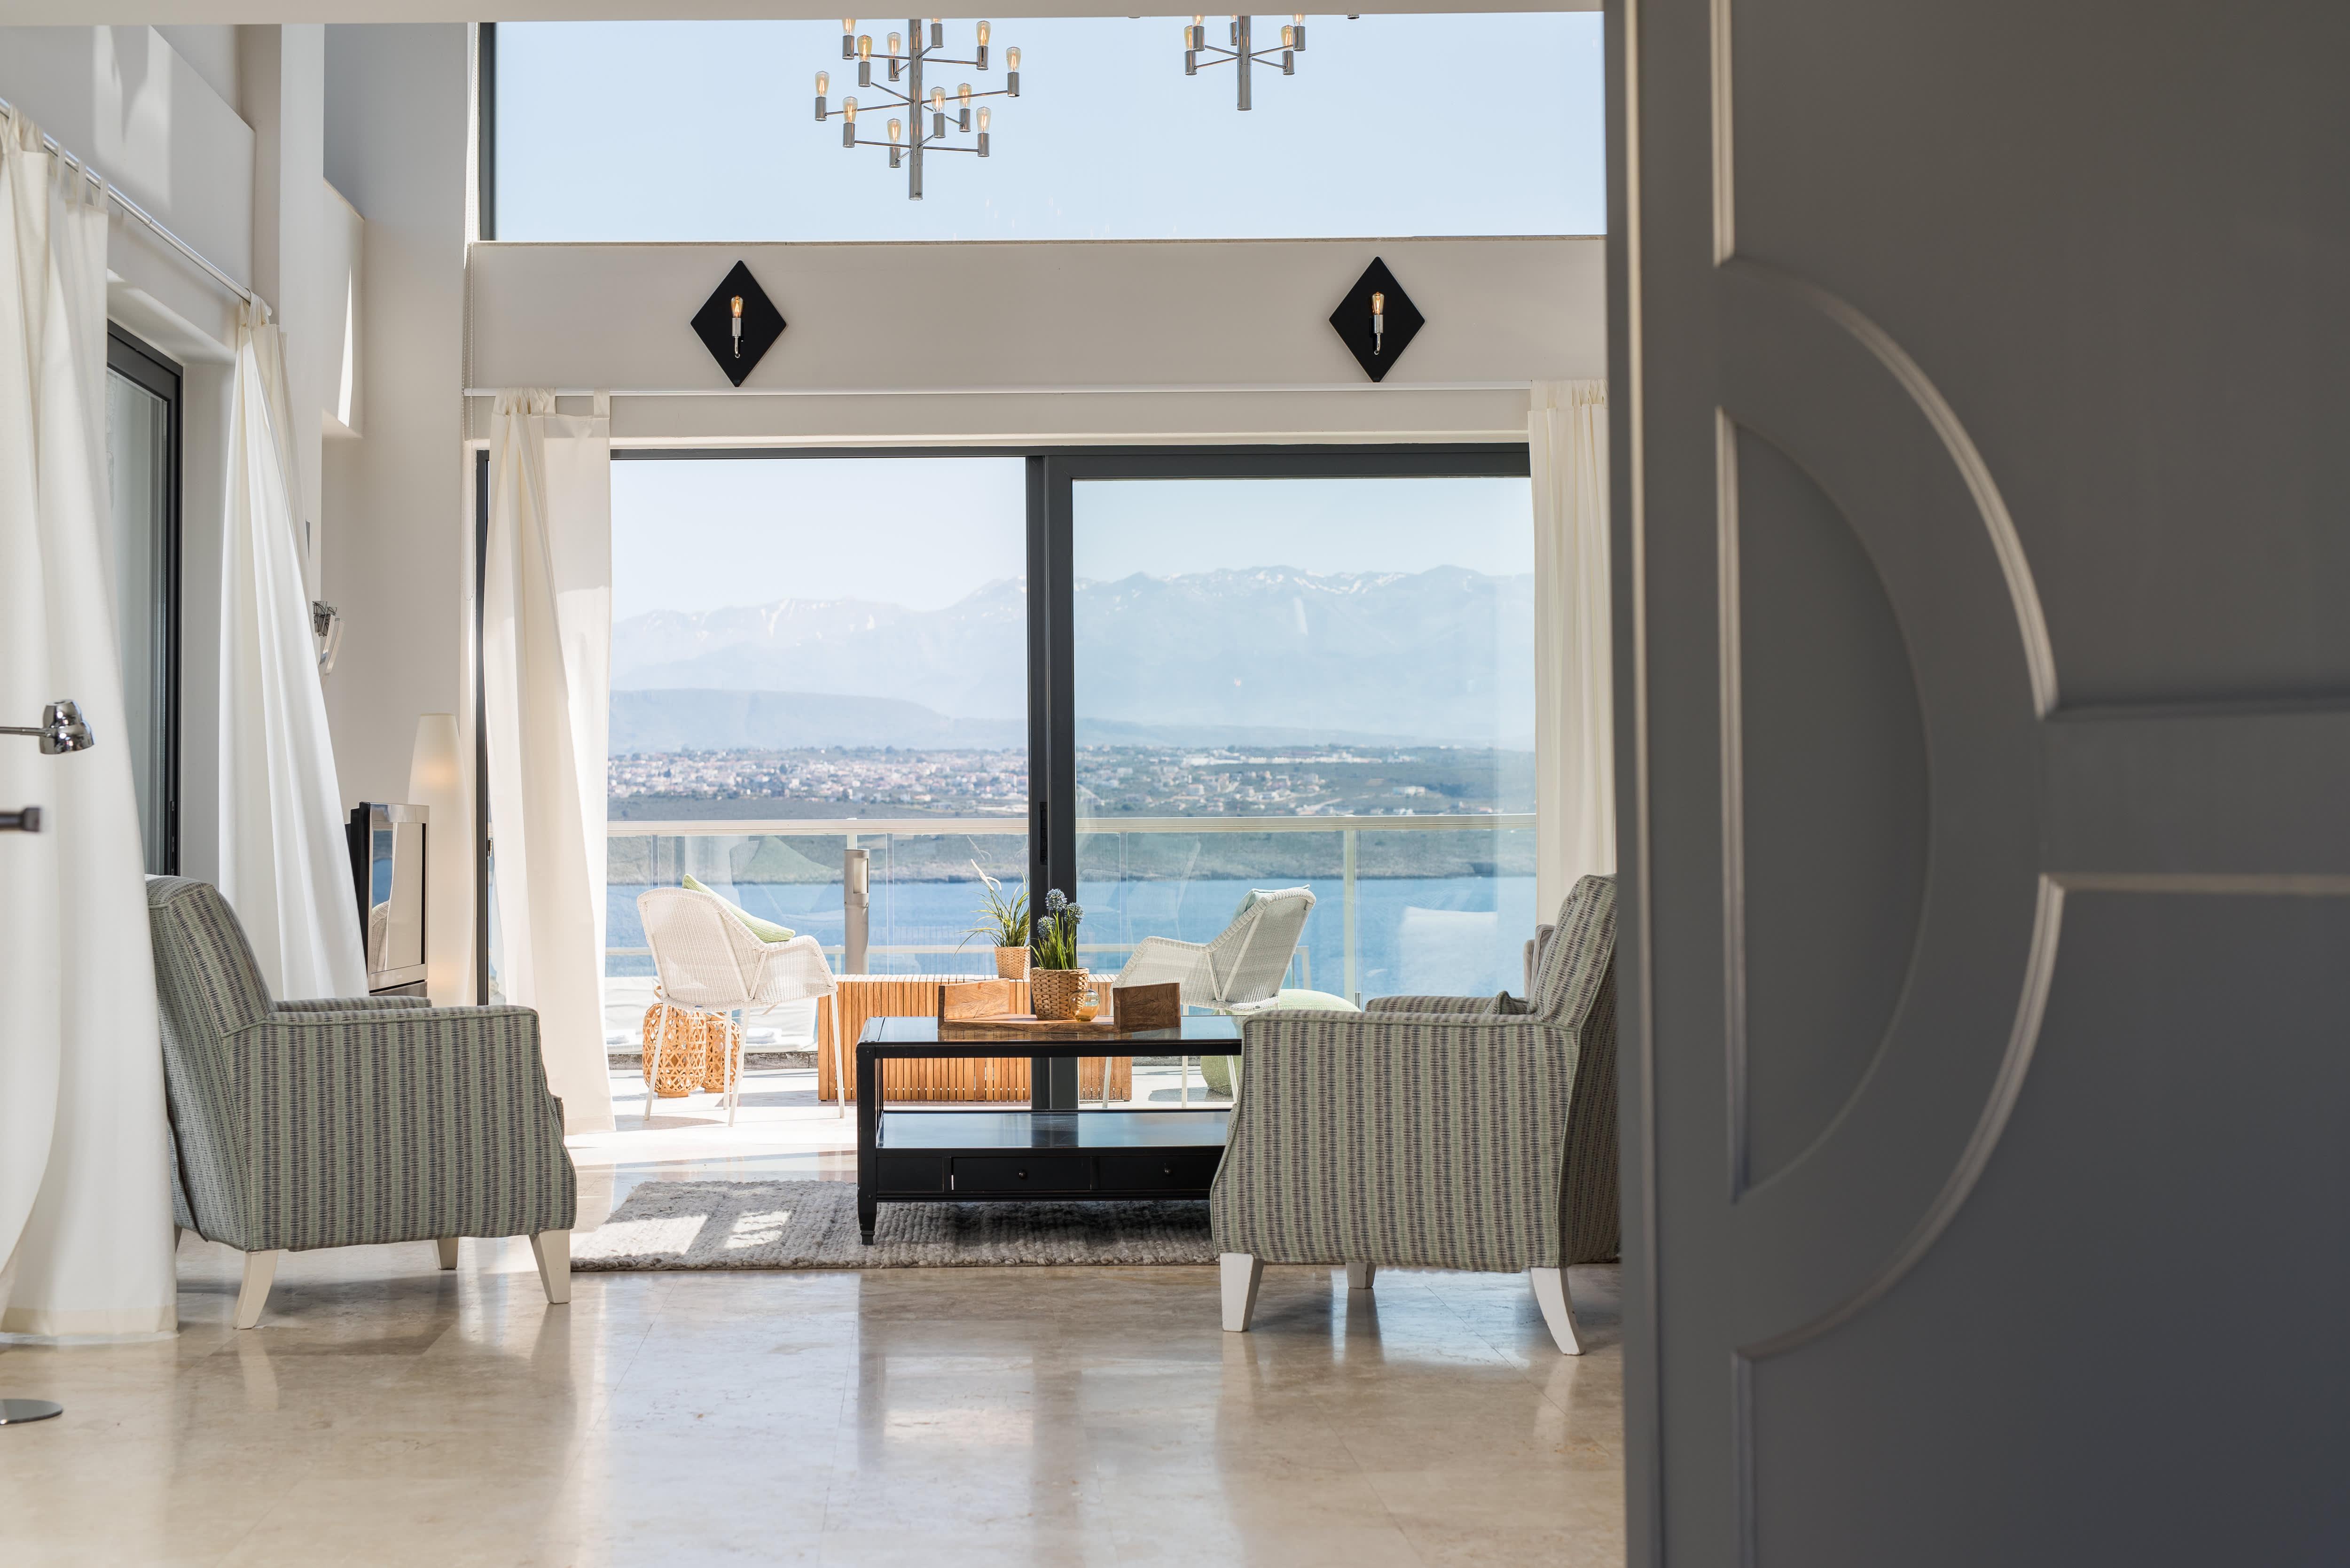 Divine Villas, Chania, Greece, Beach Home for Sale